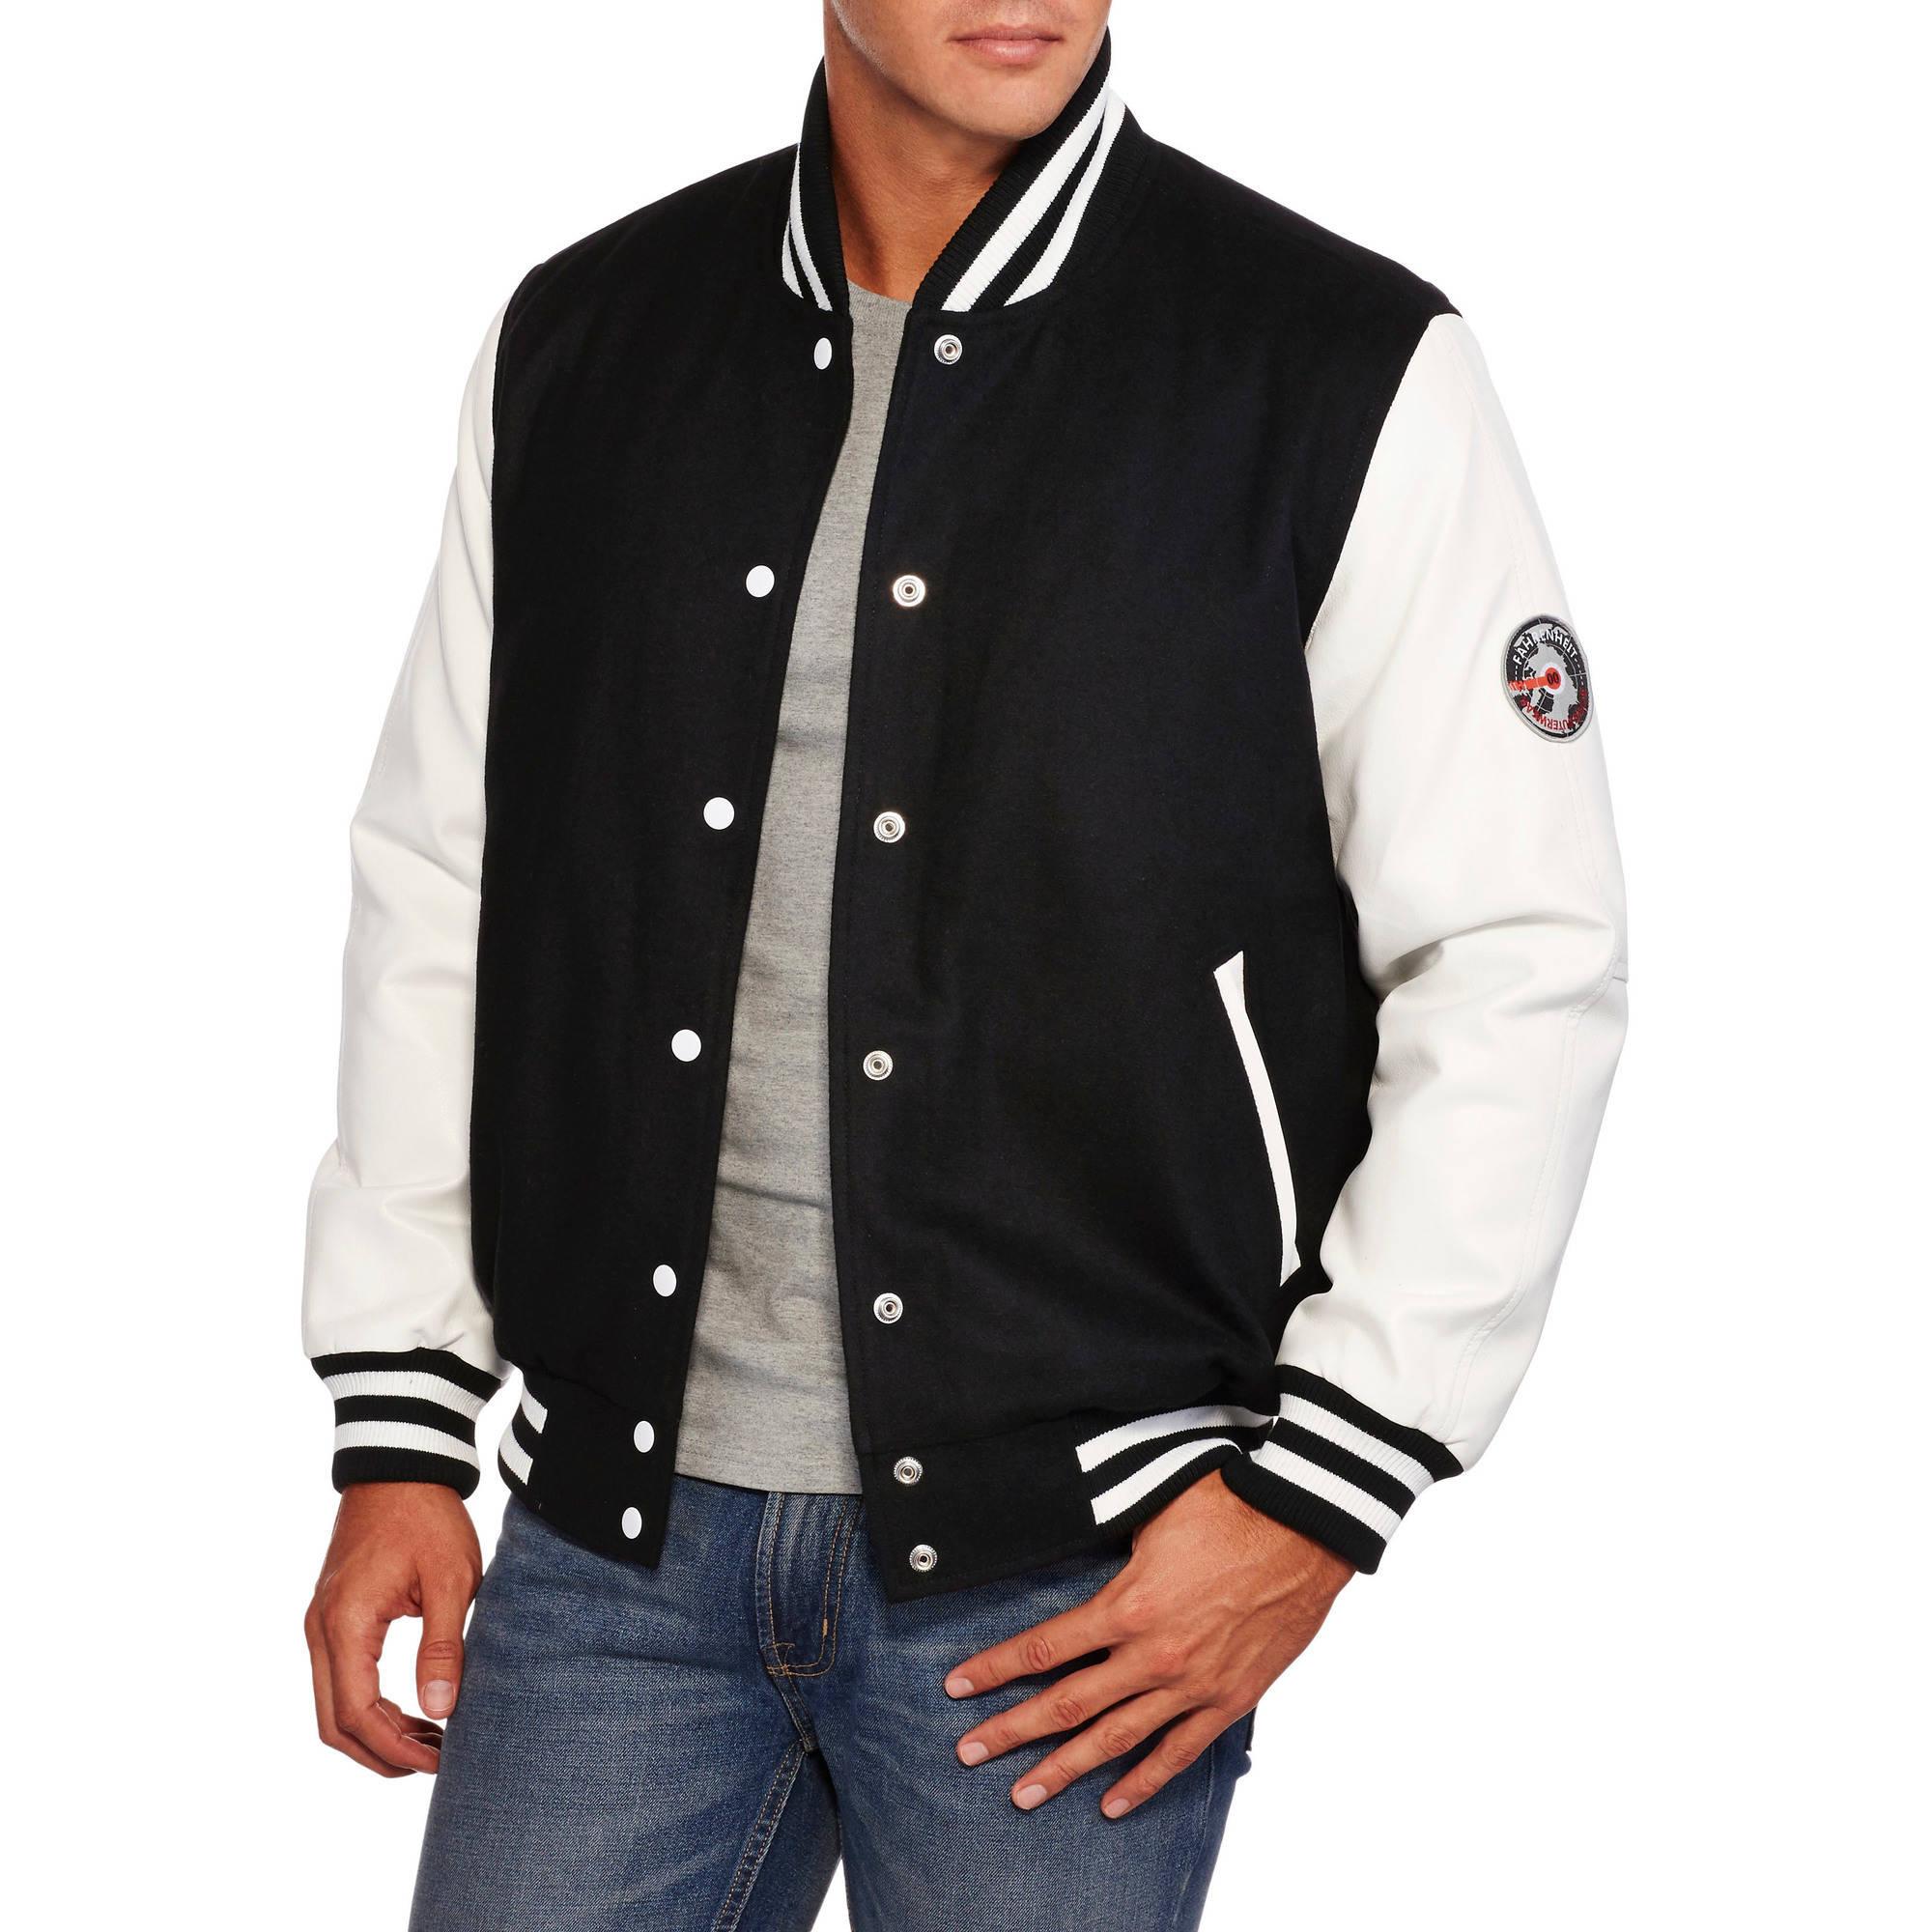 Big Men's Wool Blend Bomber Jacket with PU Sleeves